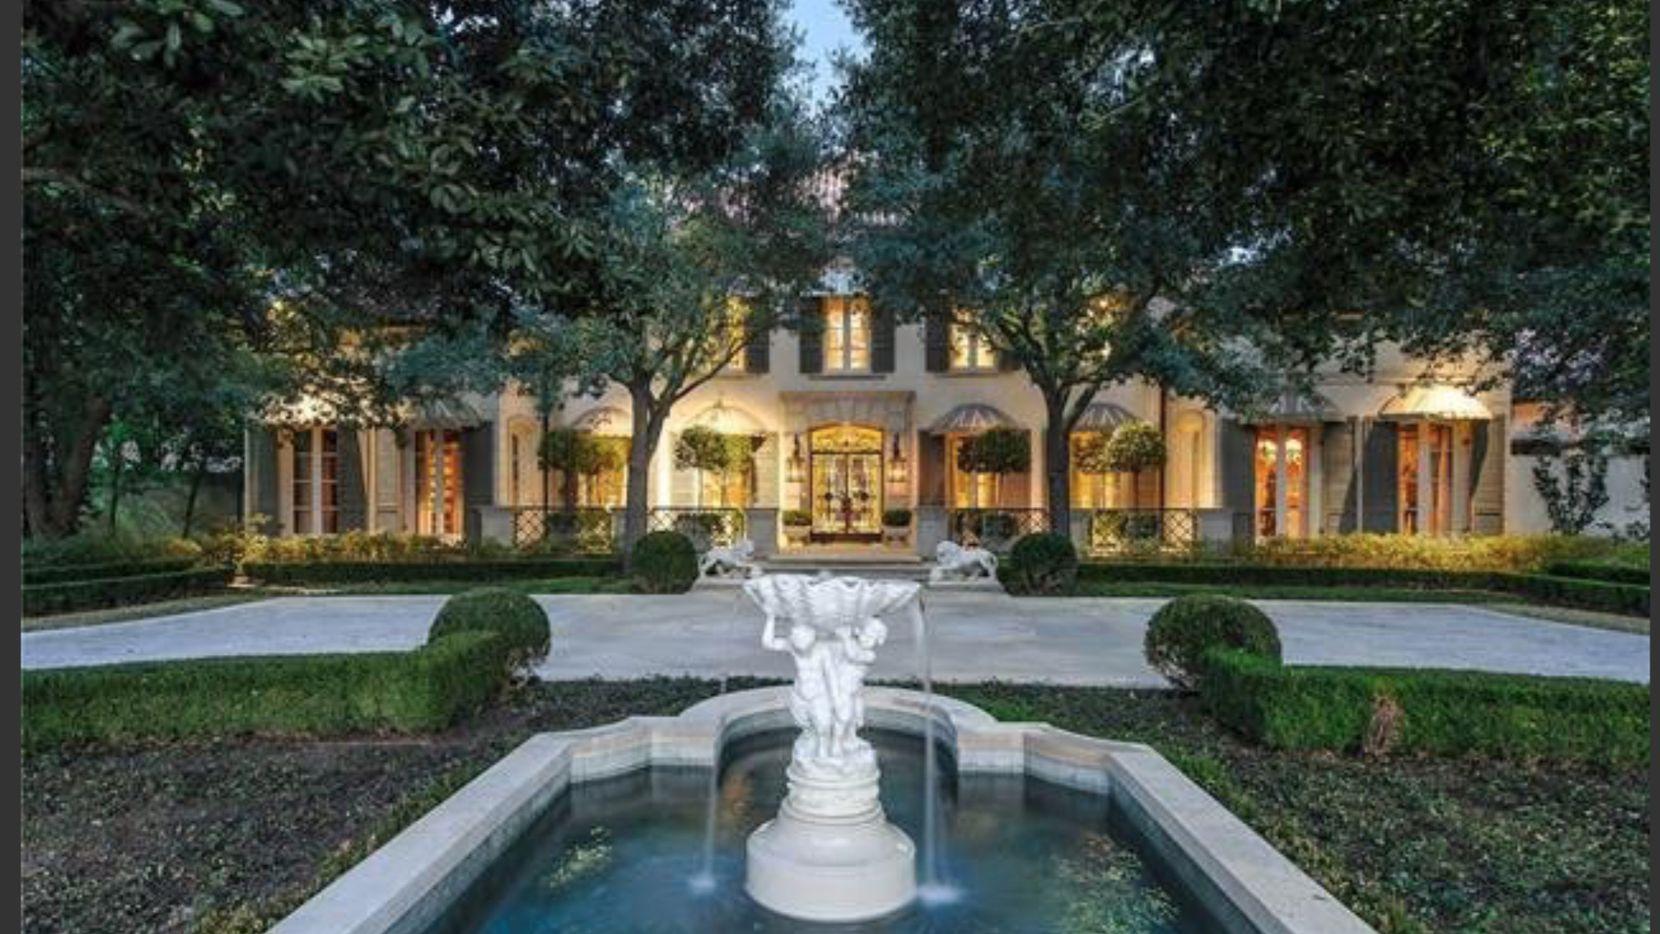 Boone Pickens' North Dallas estate sold to Dallas energy investment firm CEO John Calvert.